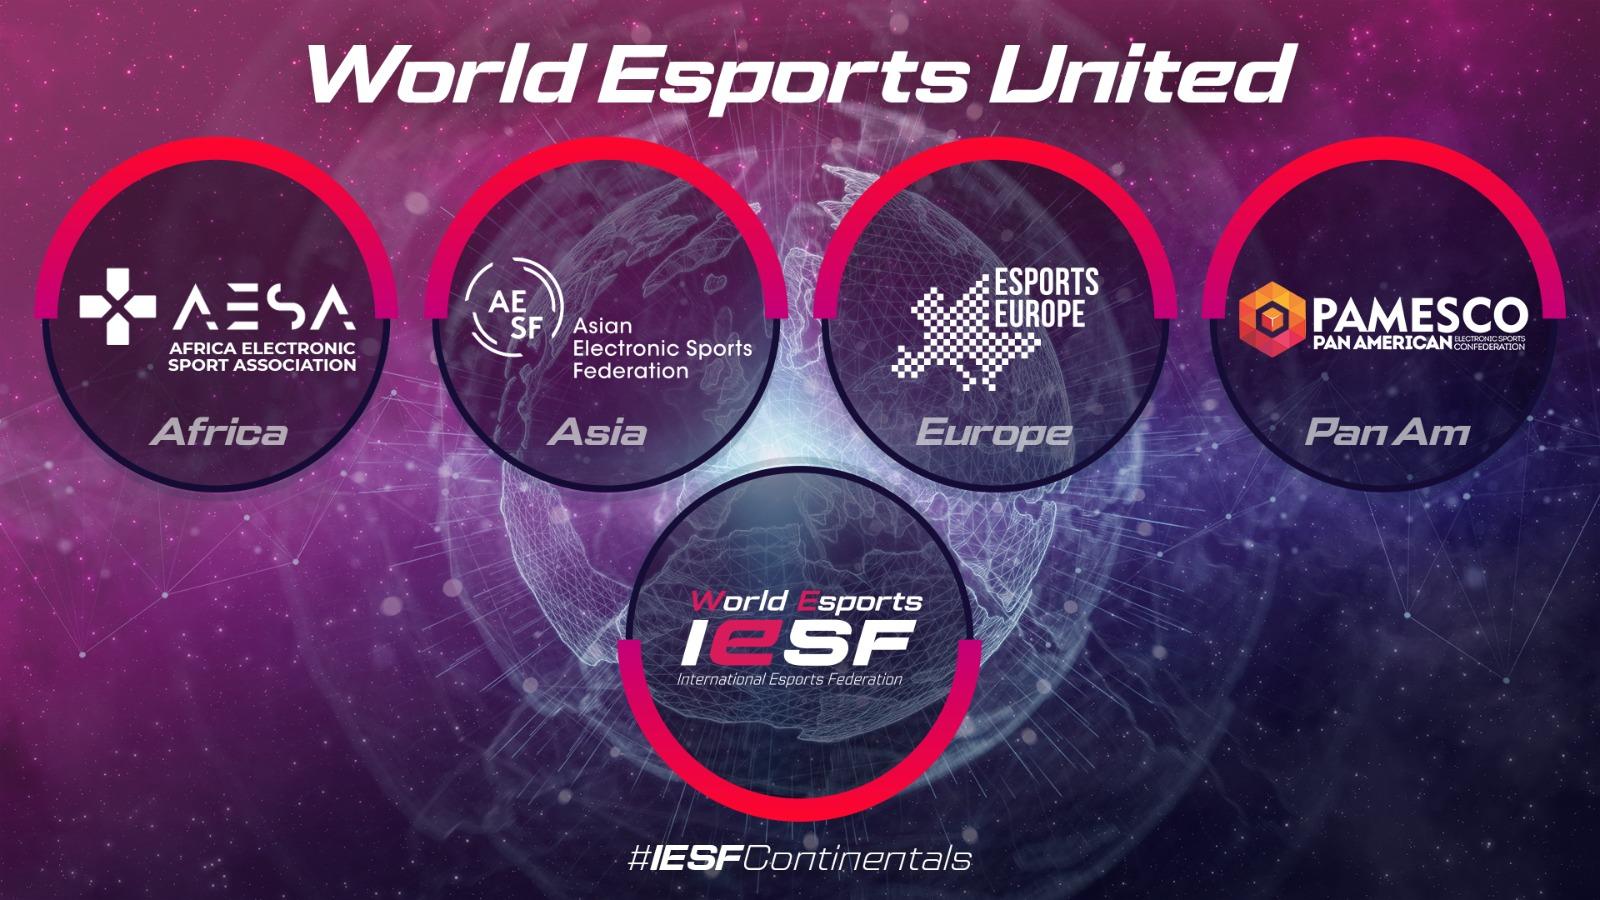 WorldEsportsUnited